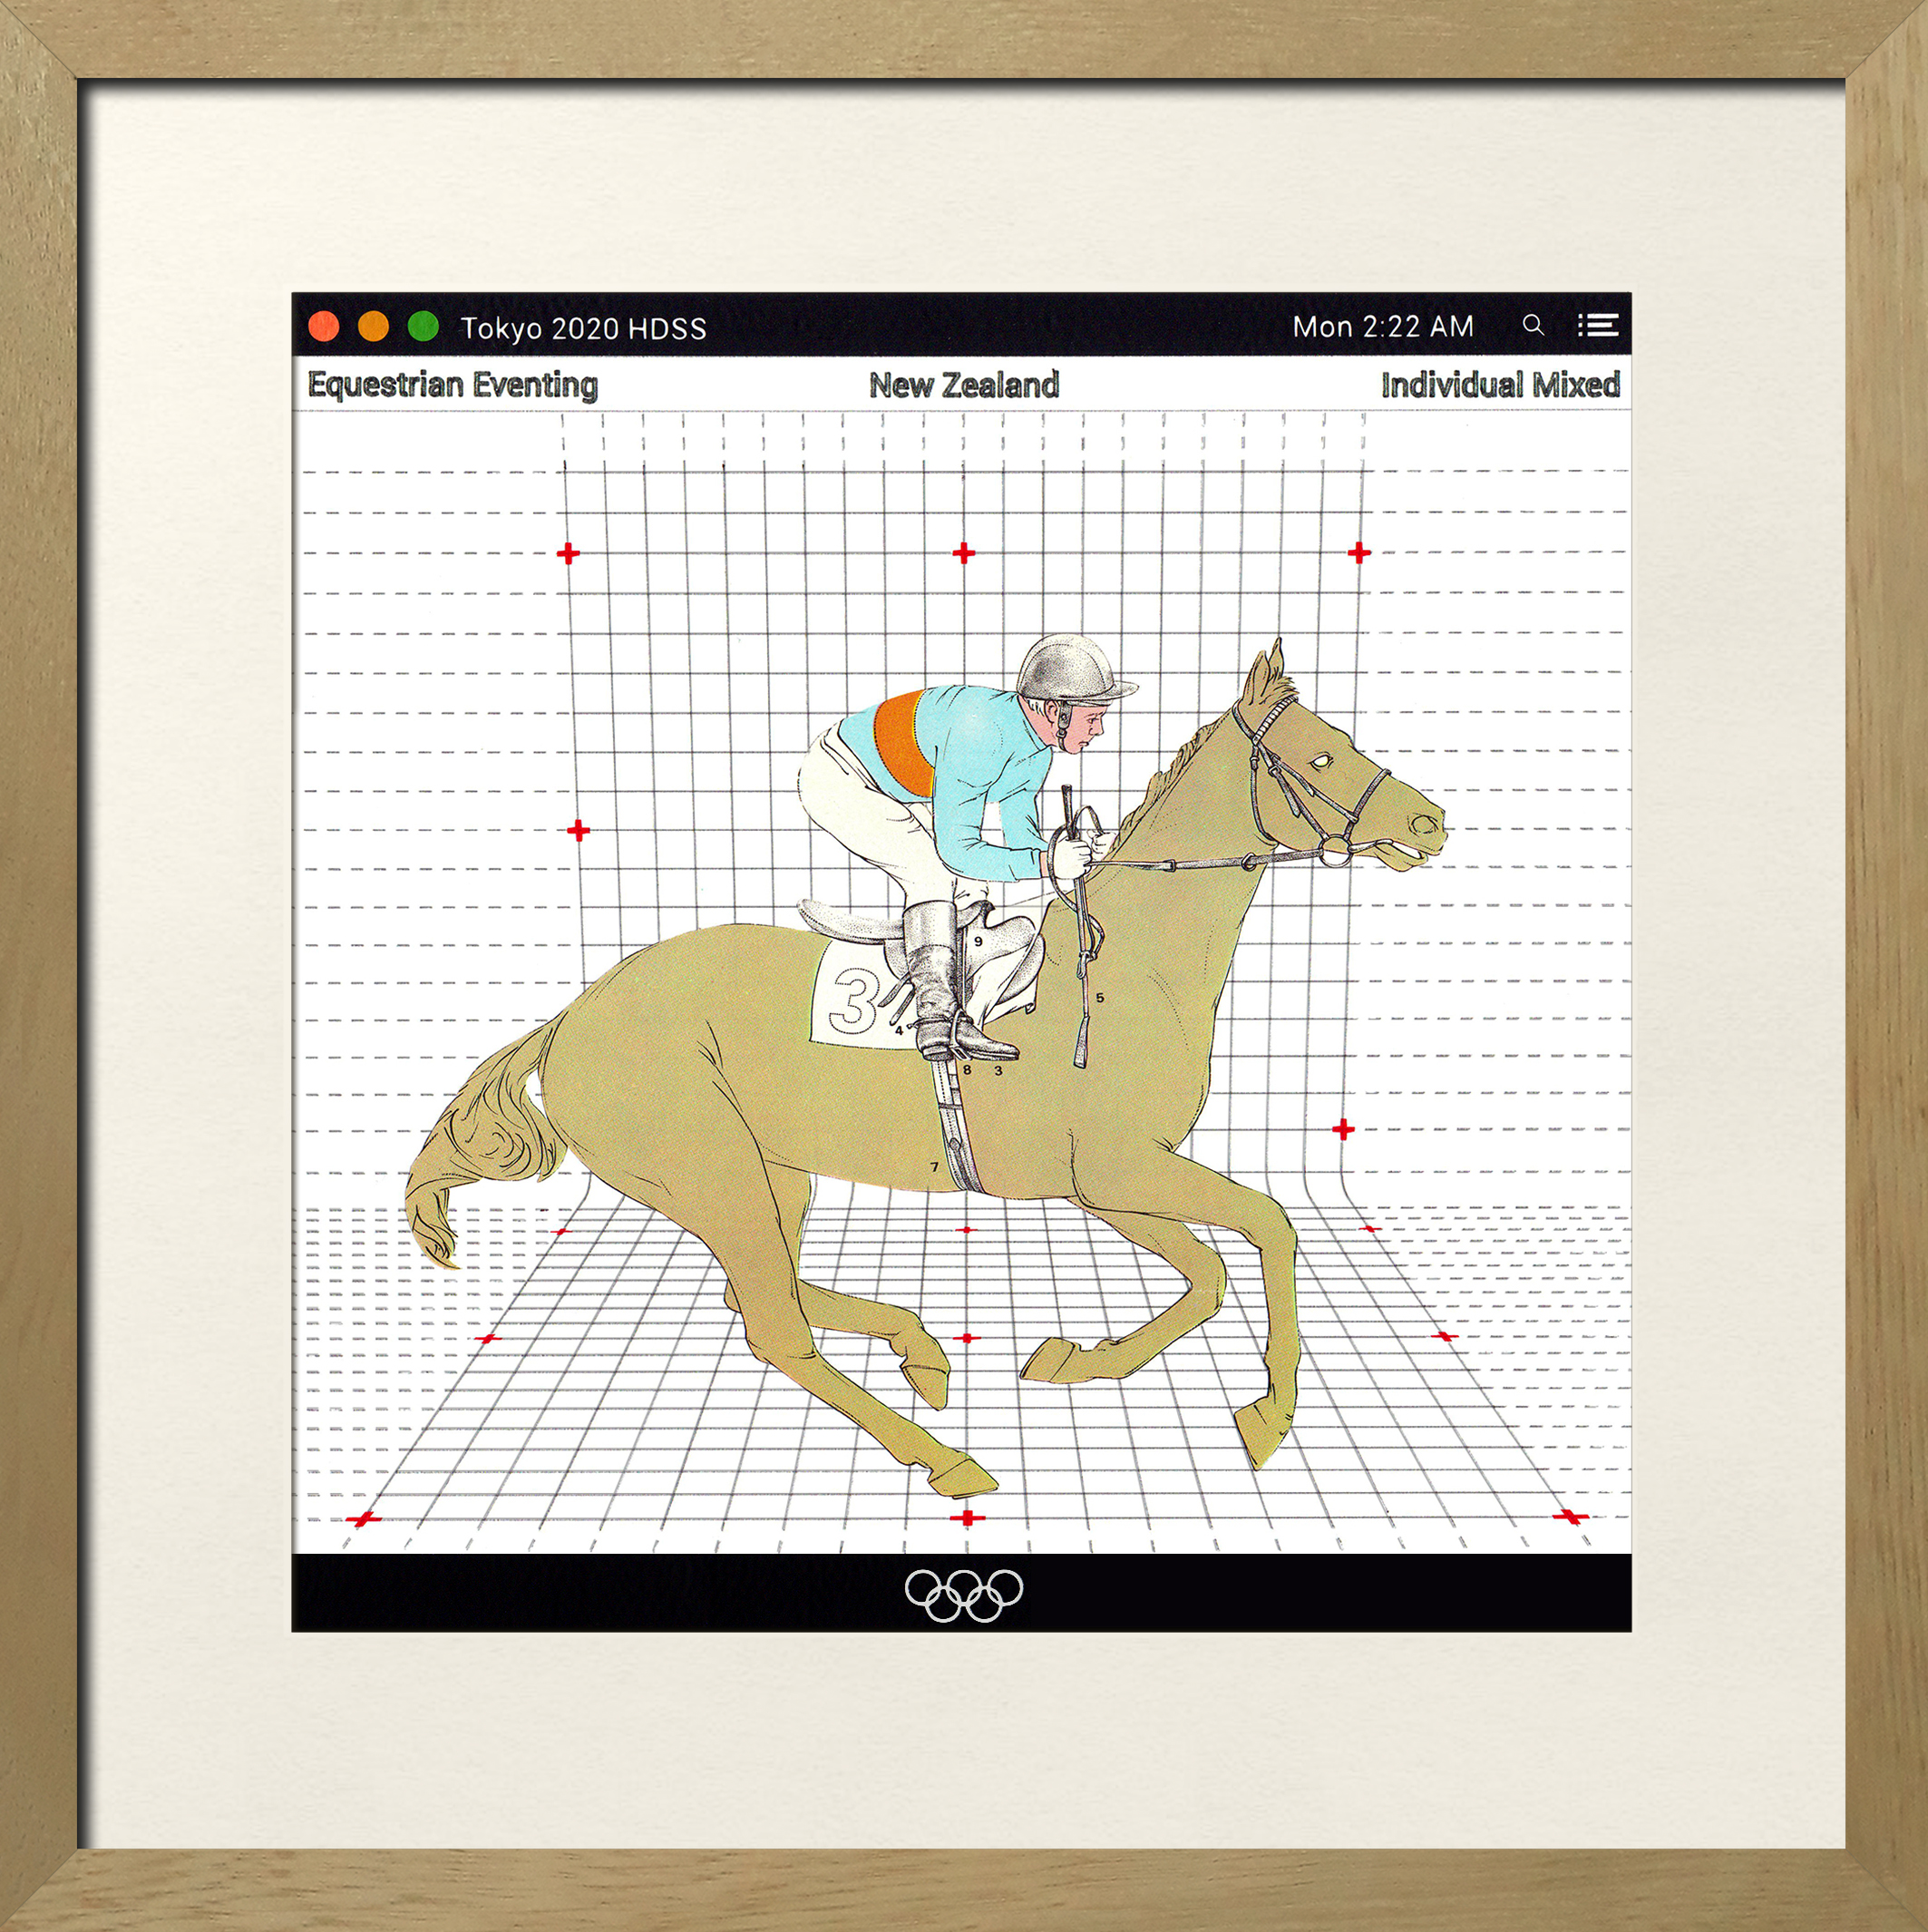 Equestrian Eventing